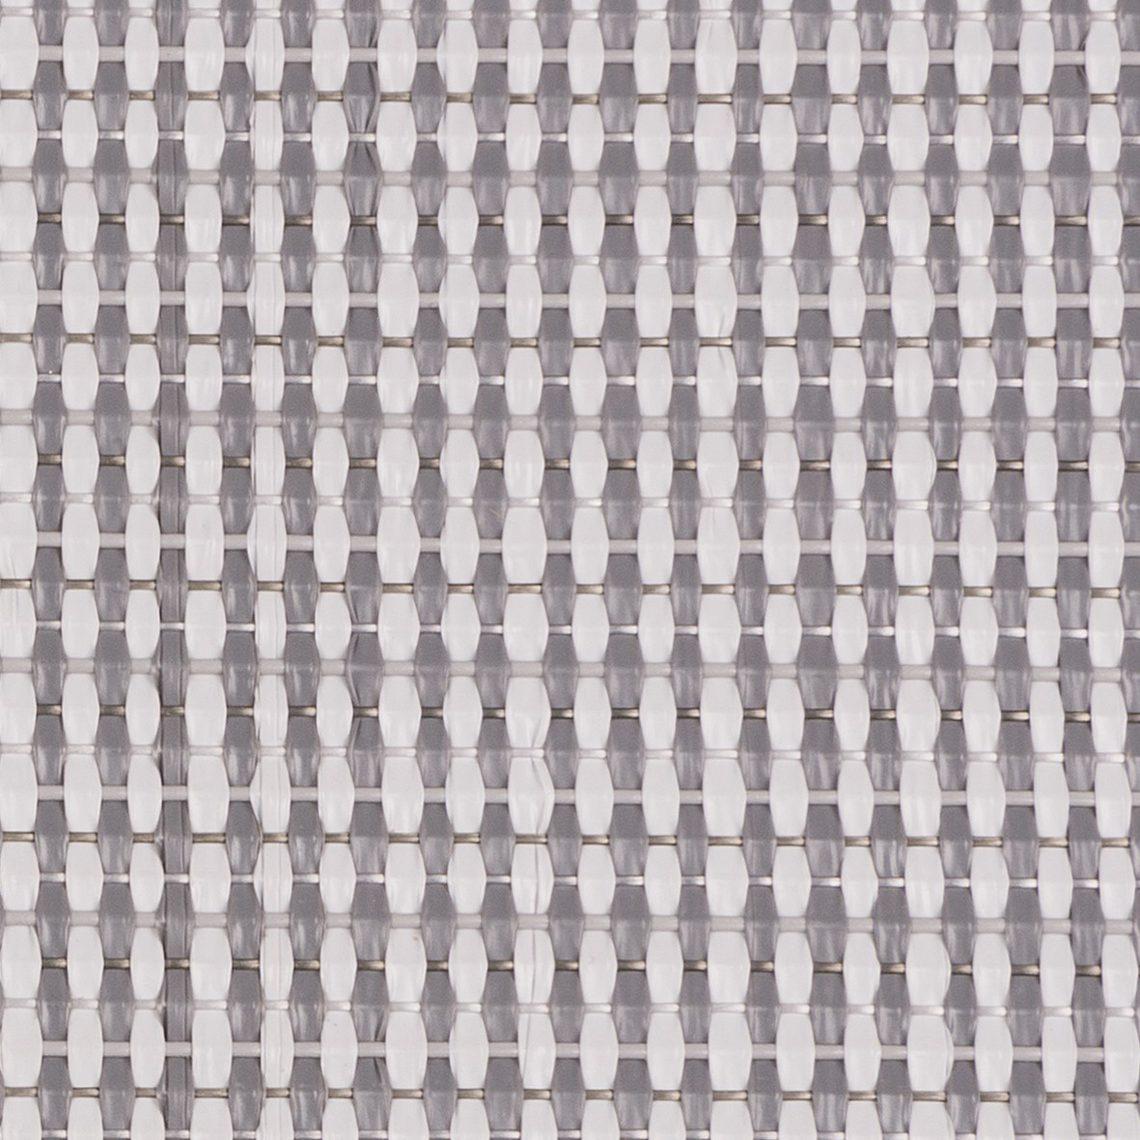 Kampa elegance carpet close up 2018